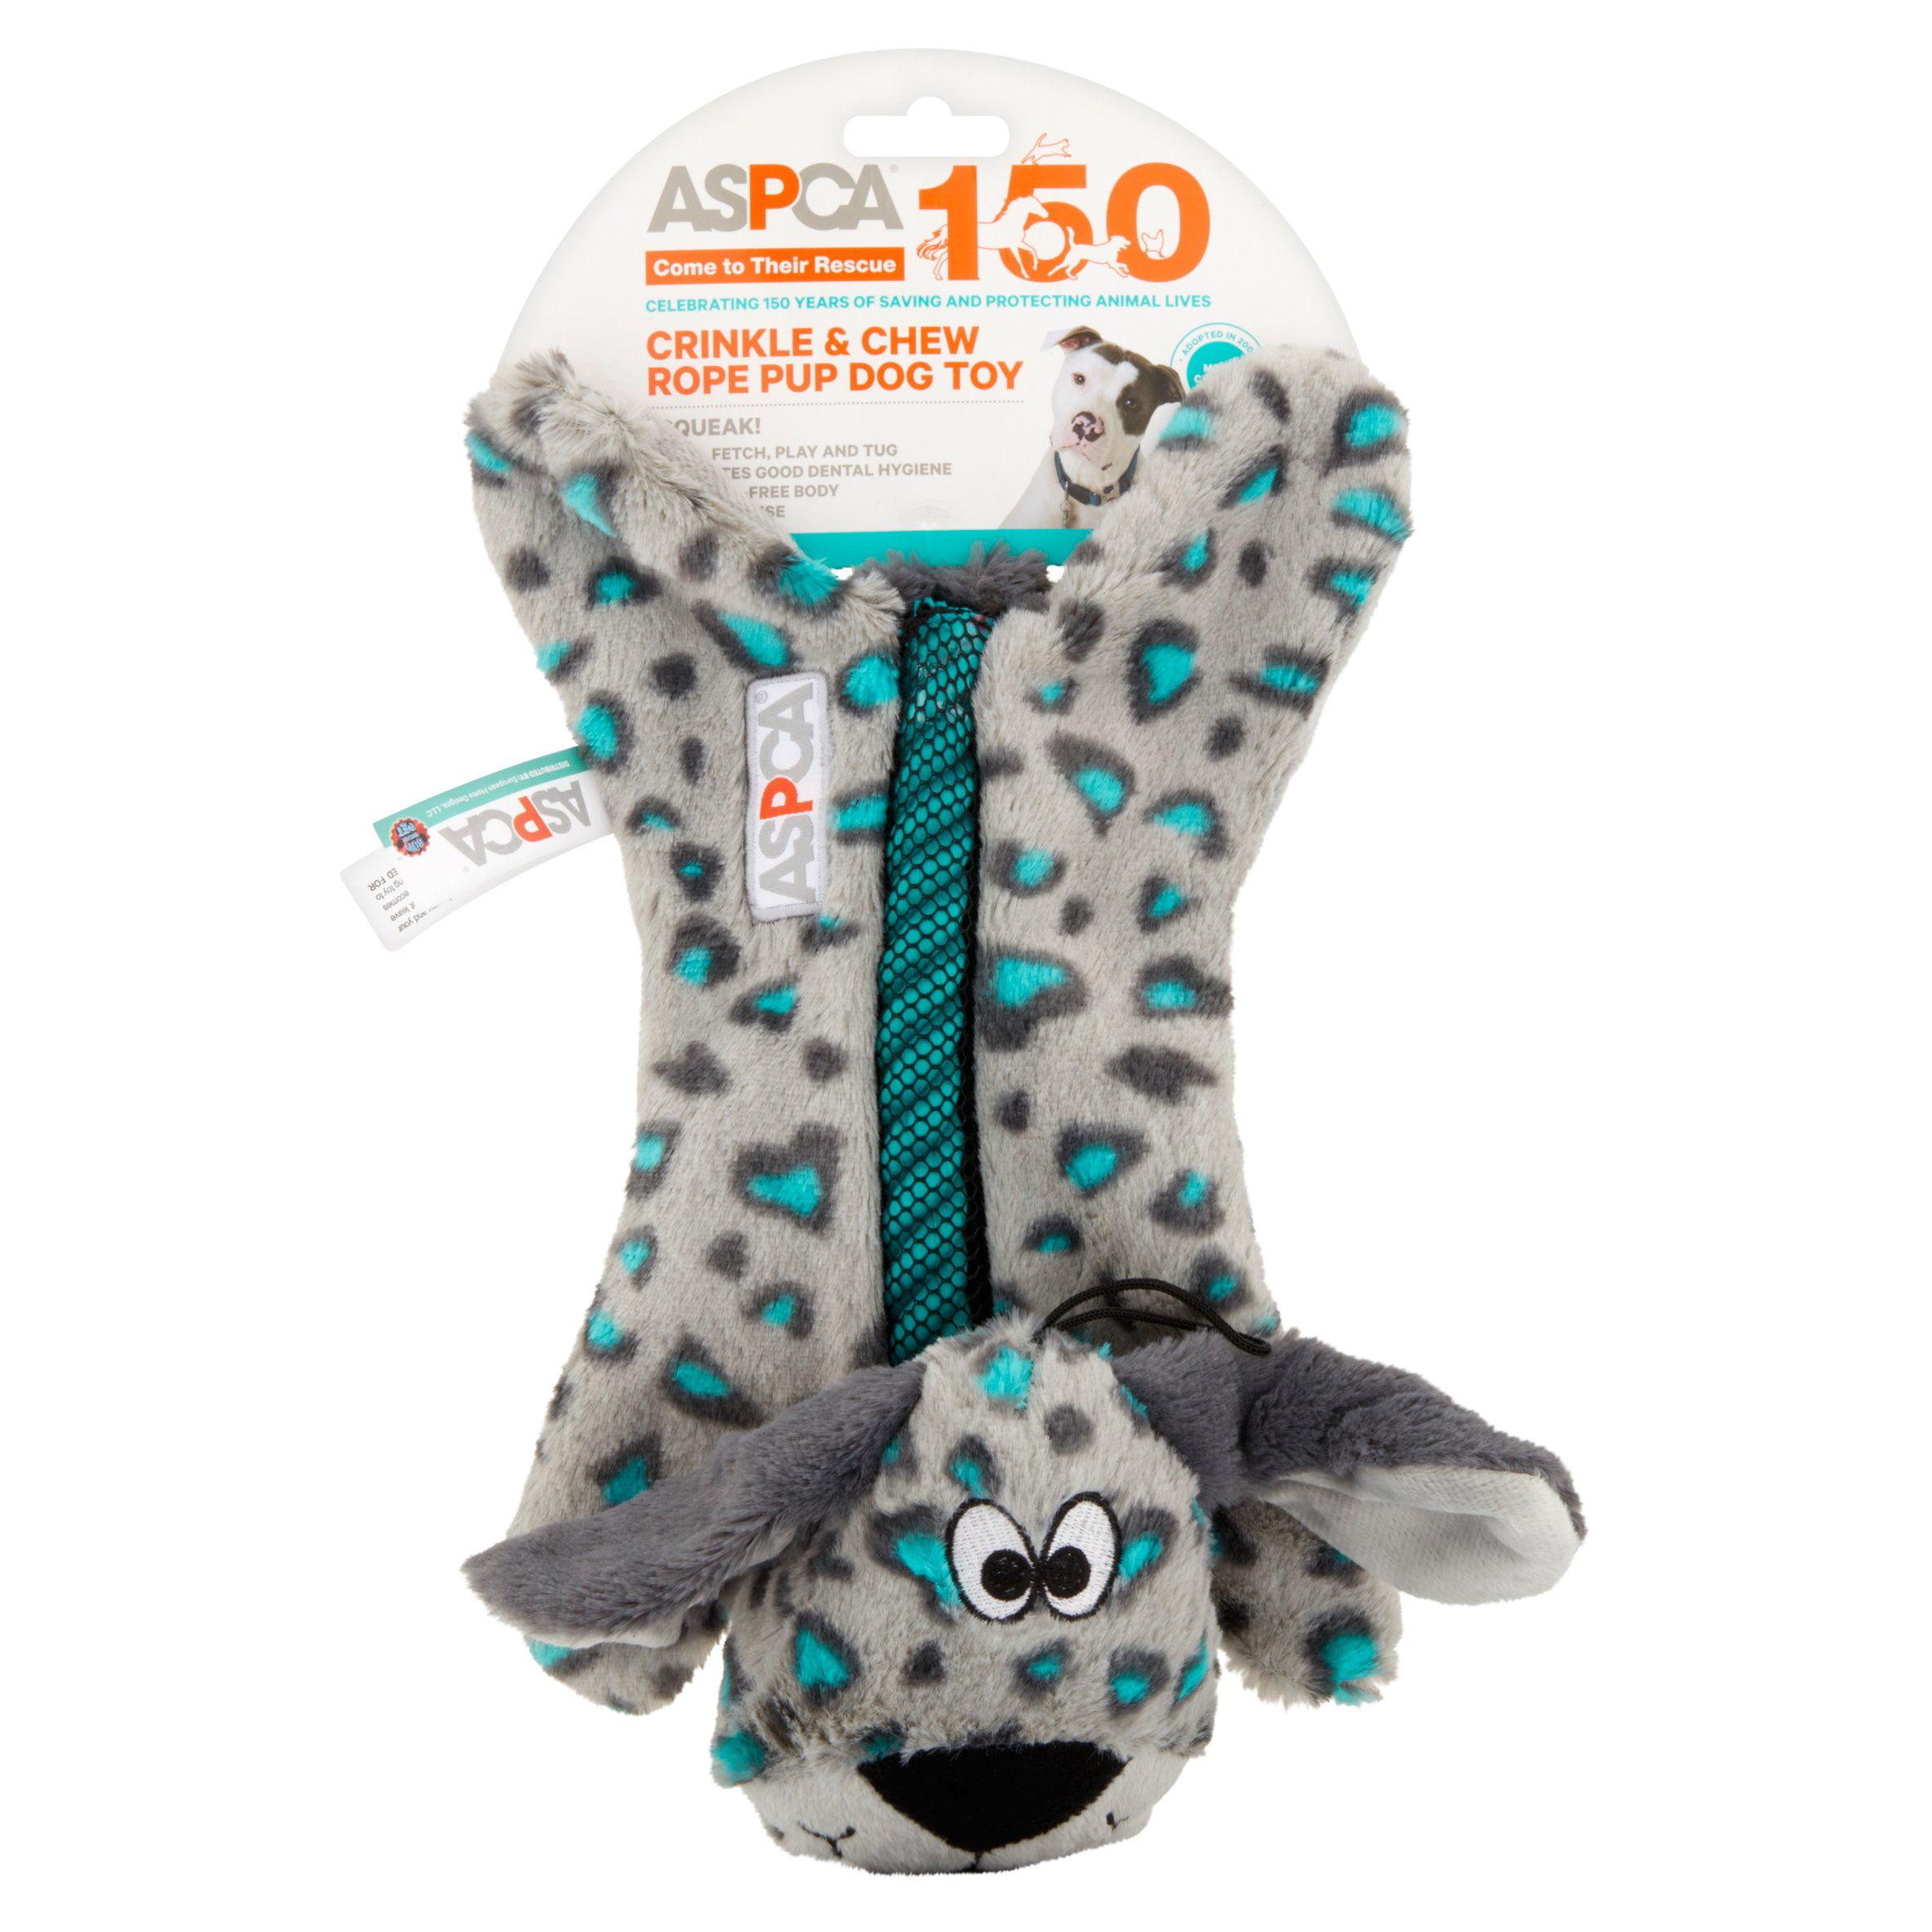 ASPCA Blue Crinkle & Chew Rope Pup Dog Toy by European Home Designs, LLC